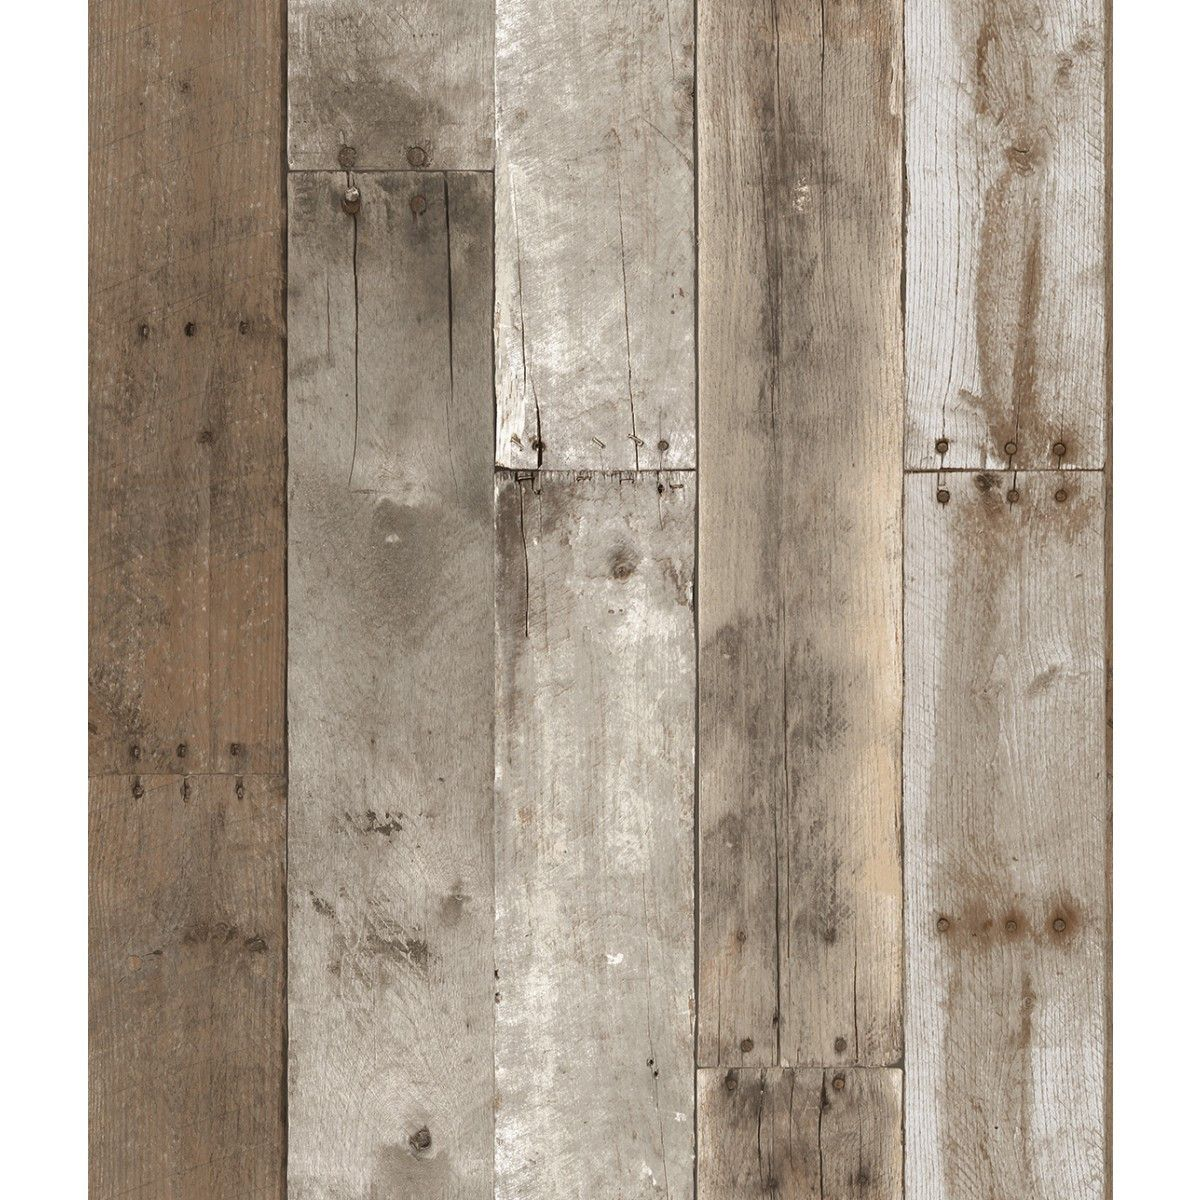 Repurposed Wood Weathered Textured Self Adhesive Wallpaper